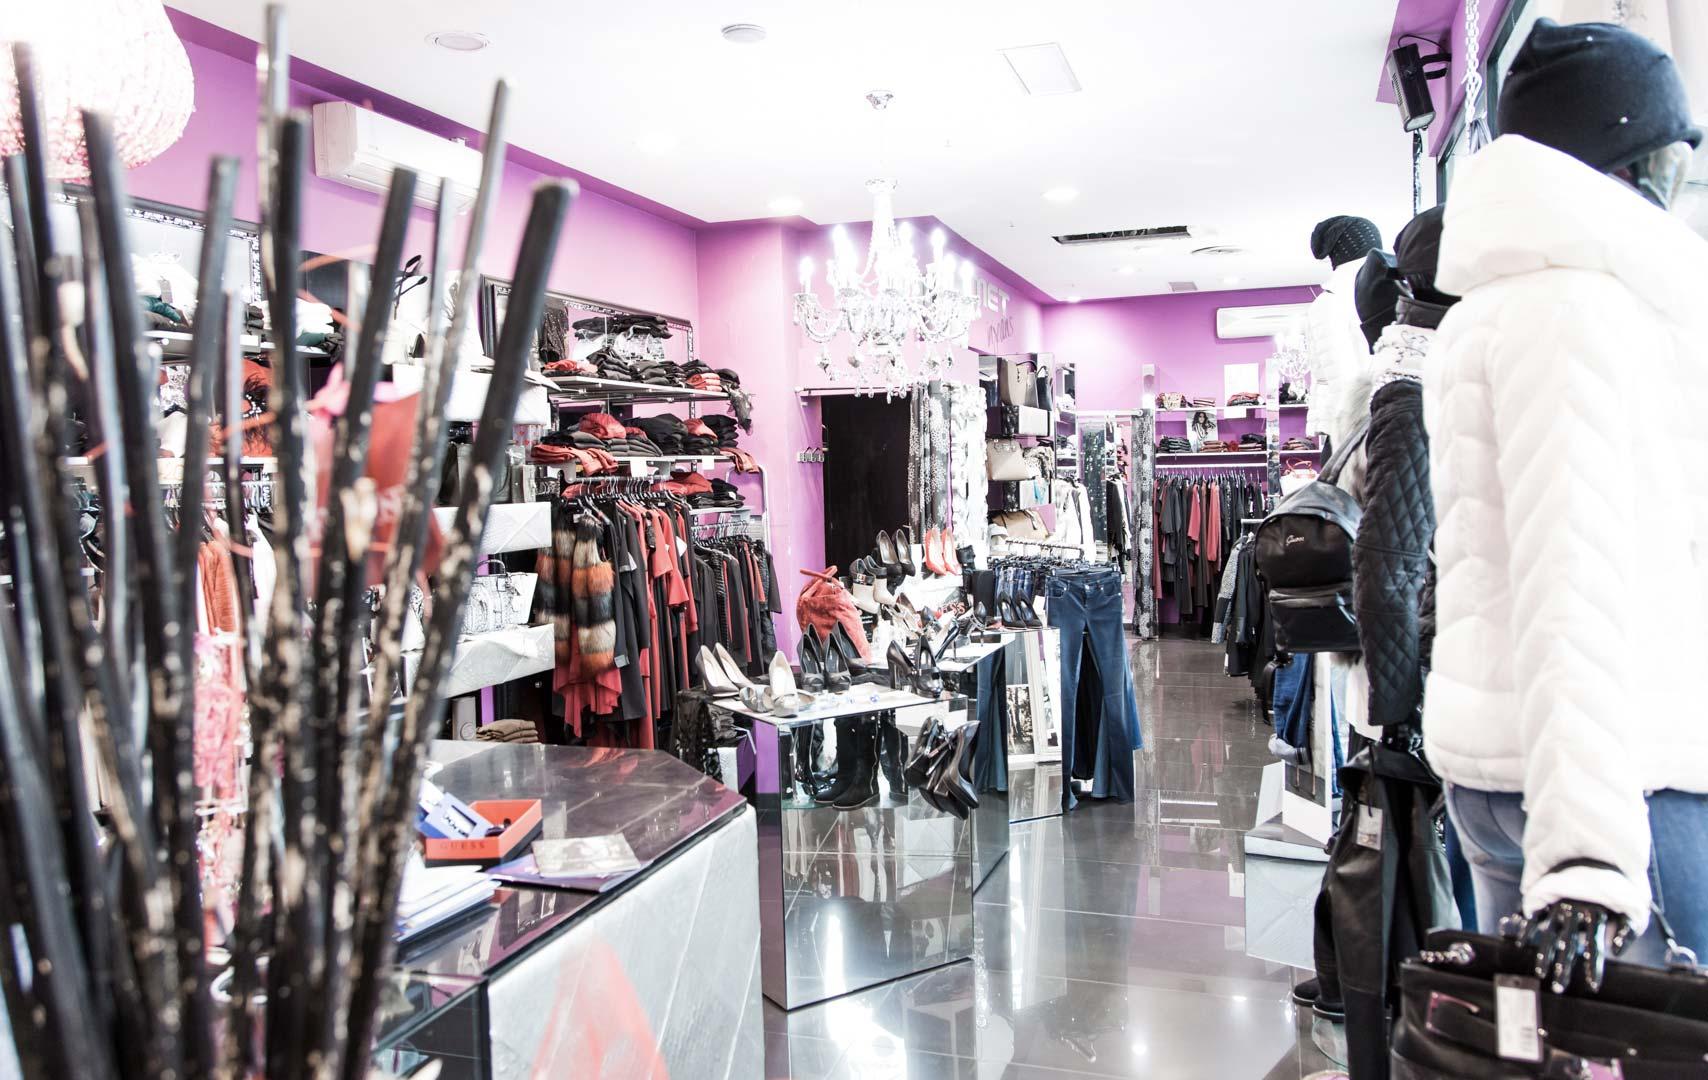 Centro commerciale pisanova fondo commerciale pisa for L arreda negozi pisa